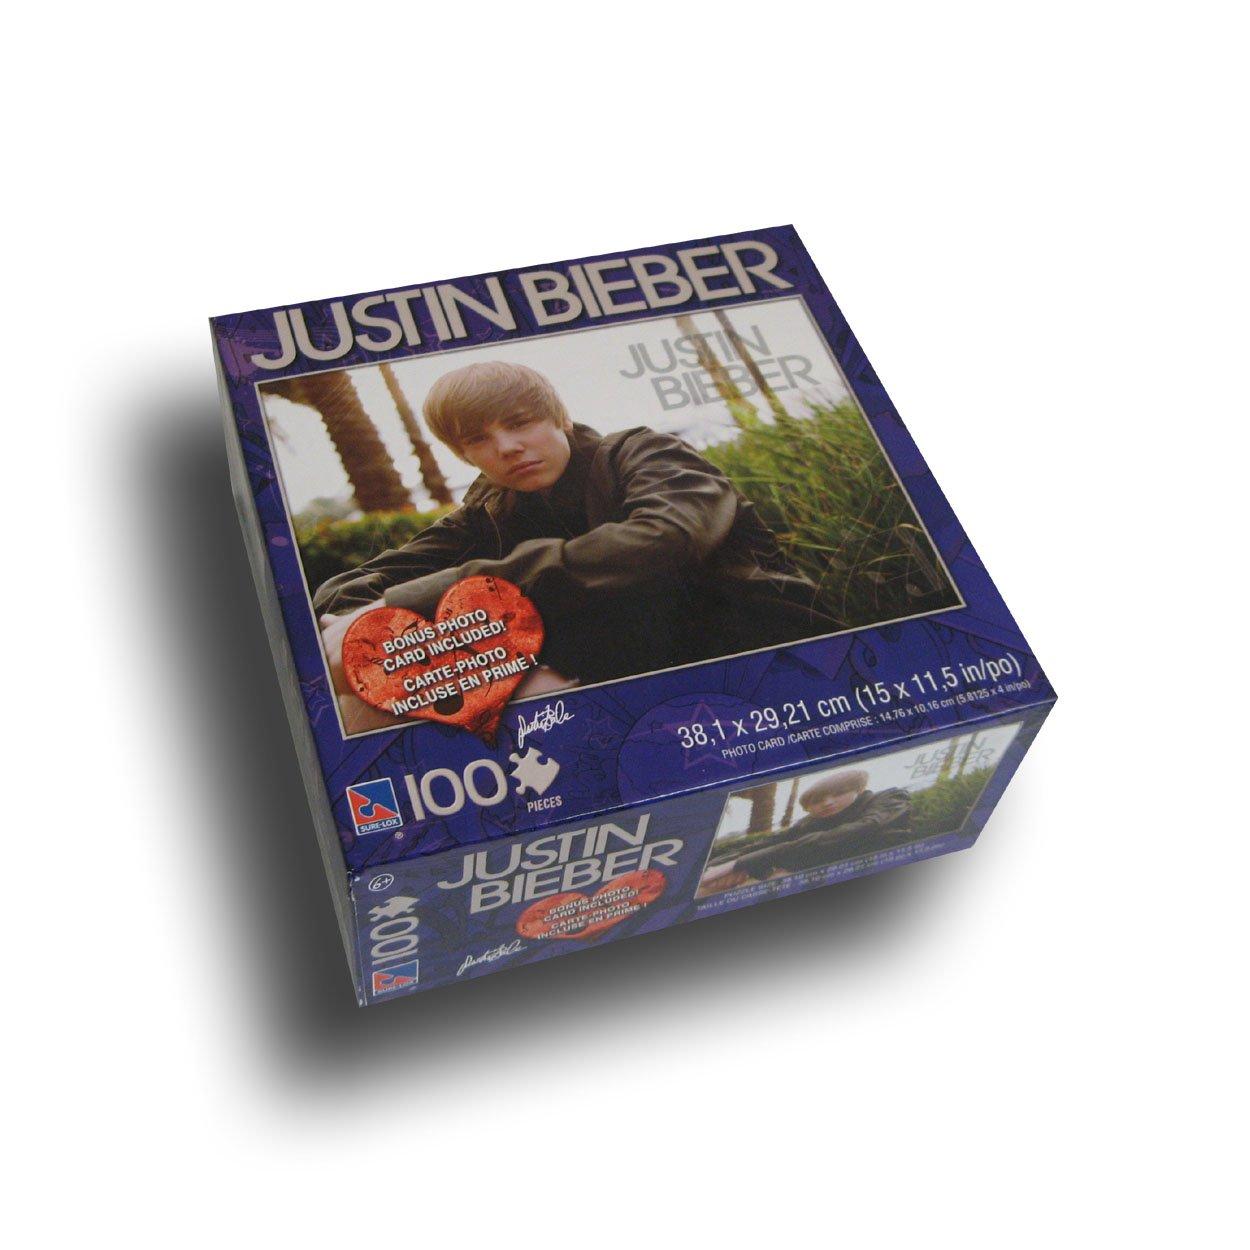 Uncategorized Justin Bieber Puzzle justin bieber 100 piece puzzle with bonus card high quality quality